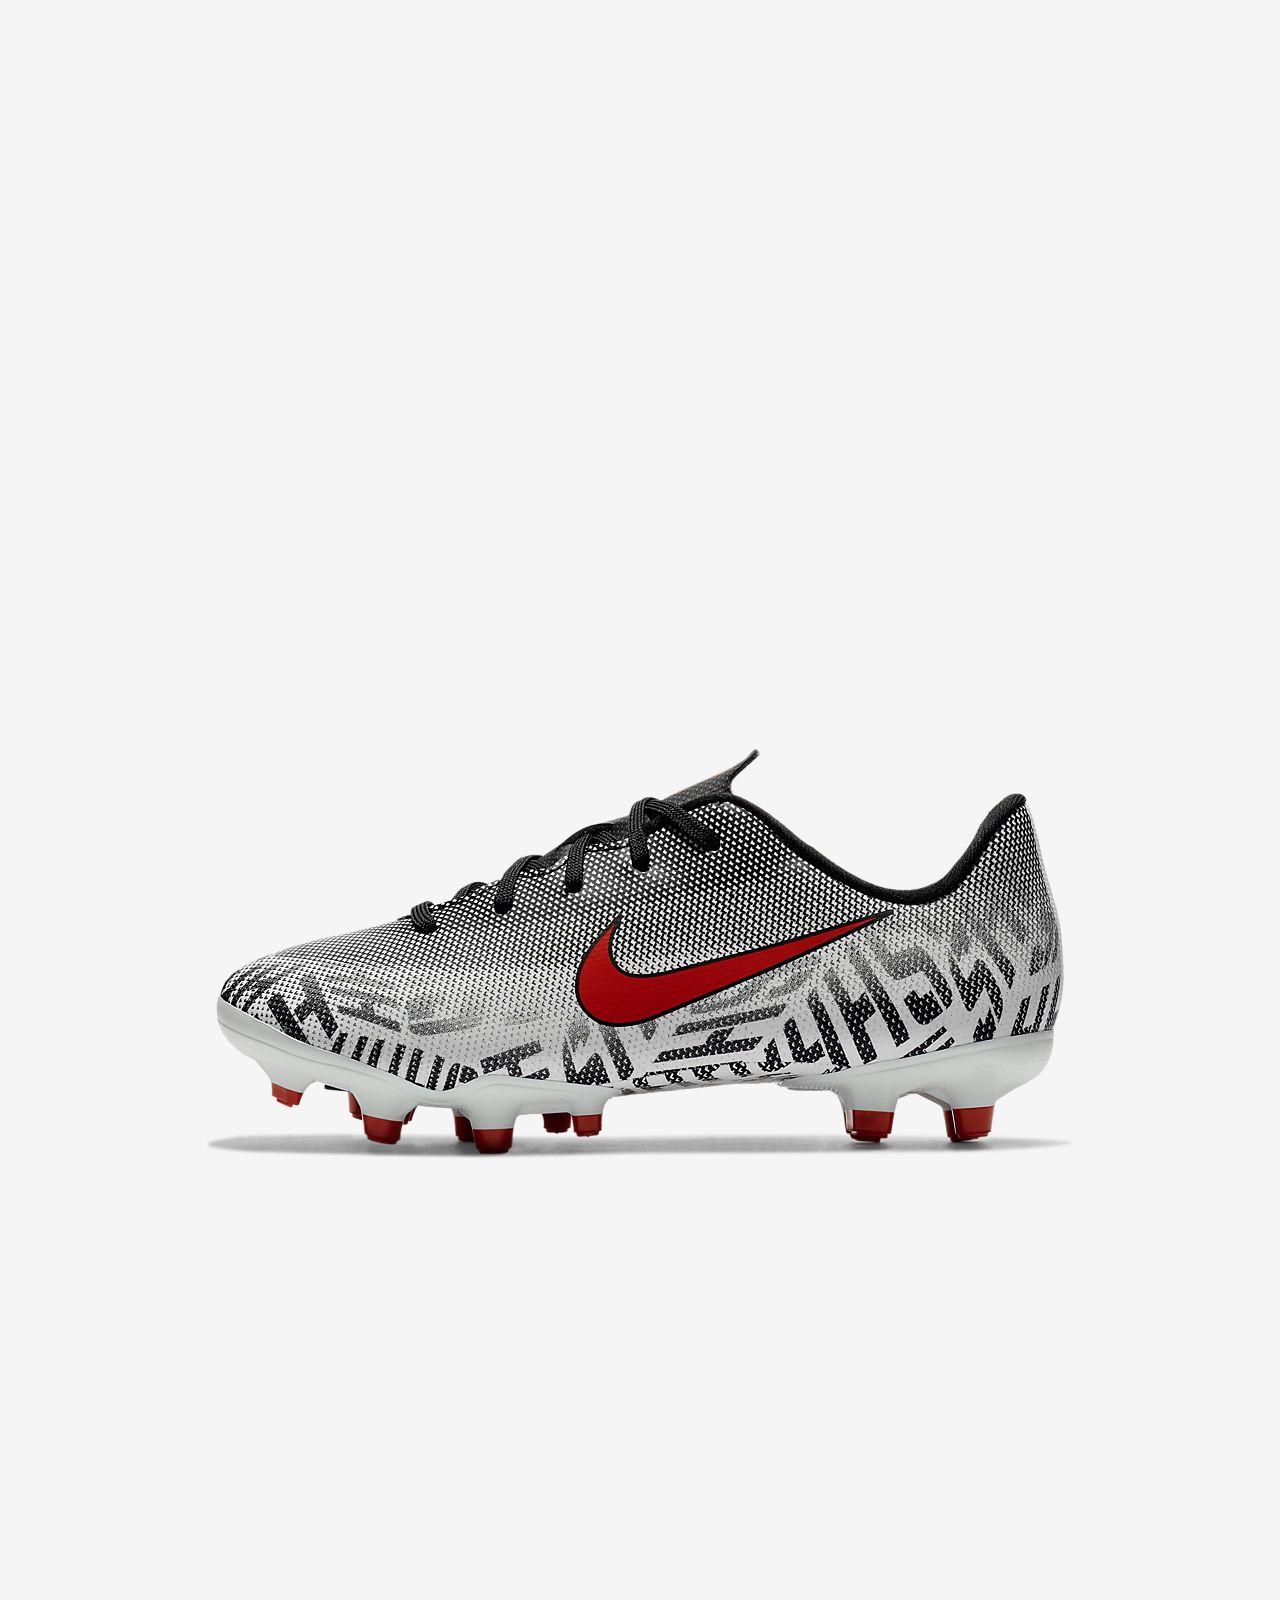 7a925ca17 Toddler/Younger Kids' Multi-Ground Football Boot. Nike Jr. Vapor XII  Academy Neymar Jr. MG